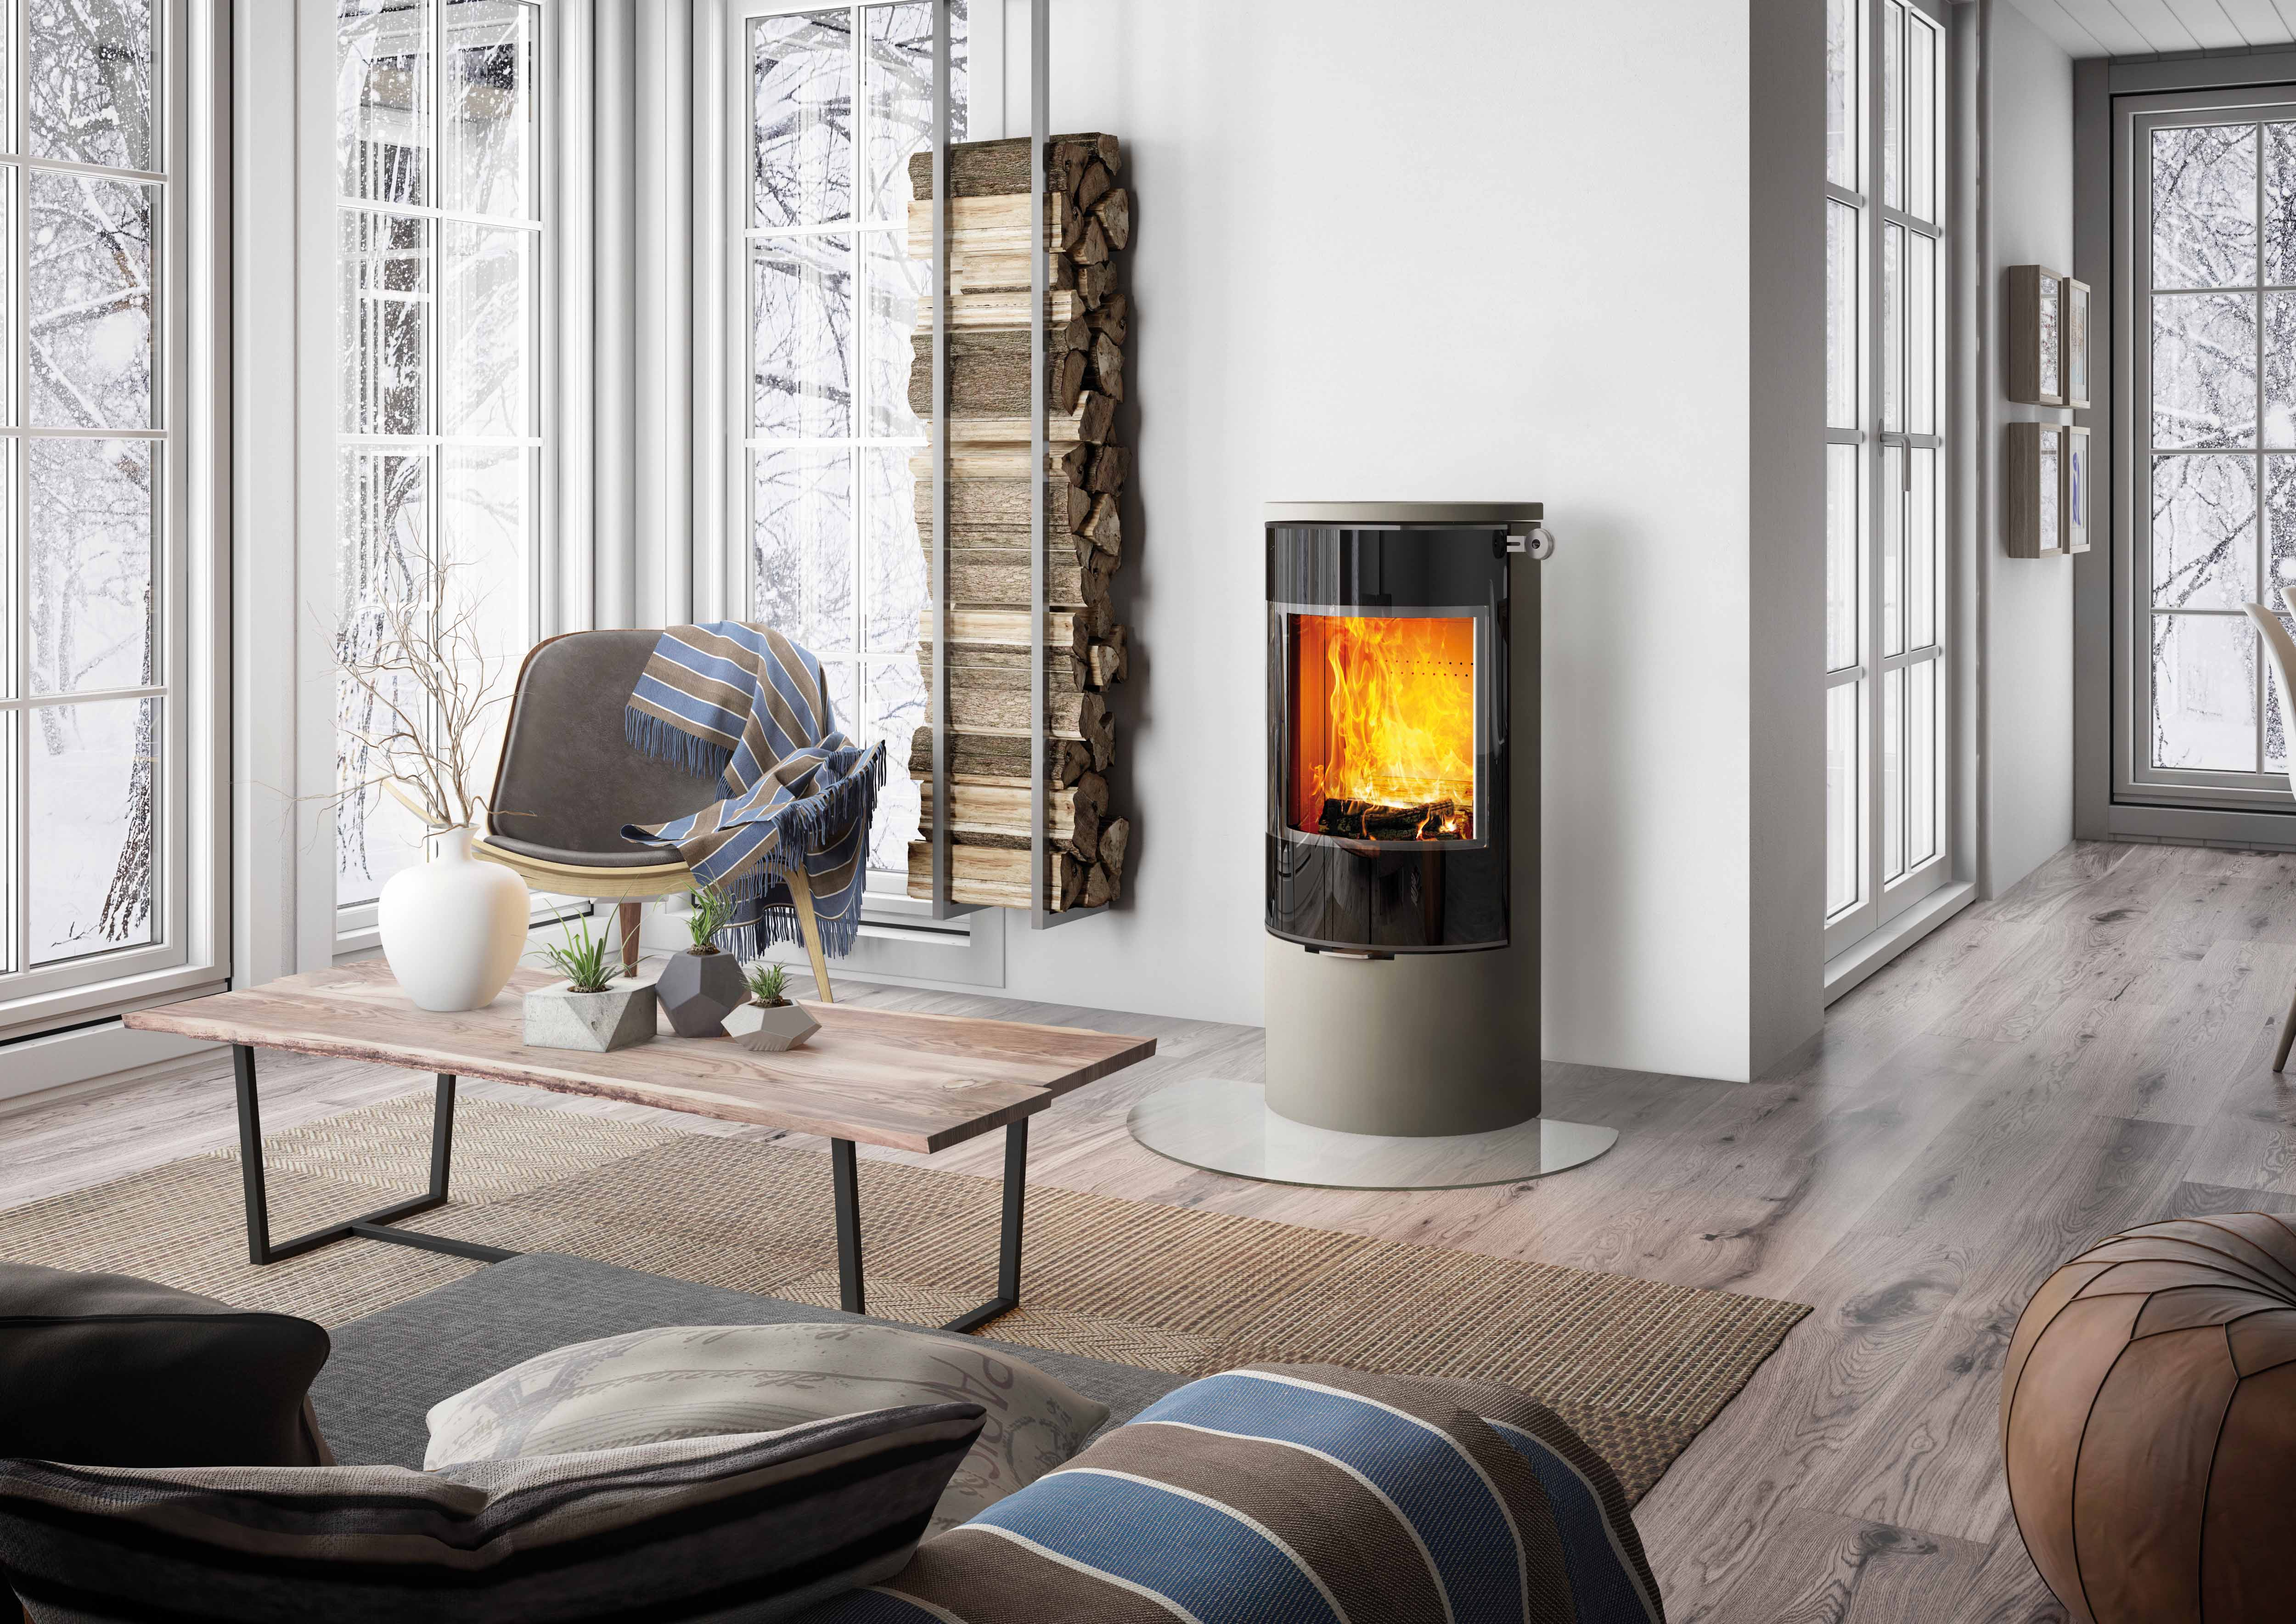 po le bois attika viva 120 l mondial po les montpellier h rault. Black Bedroom Furniture Sets. Home Design Ideas